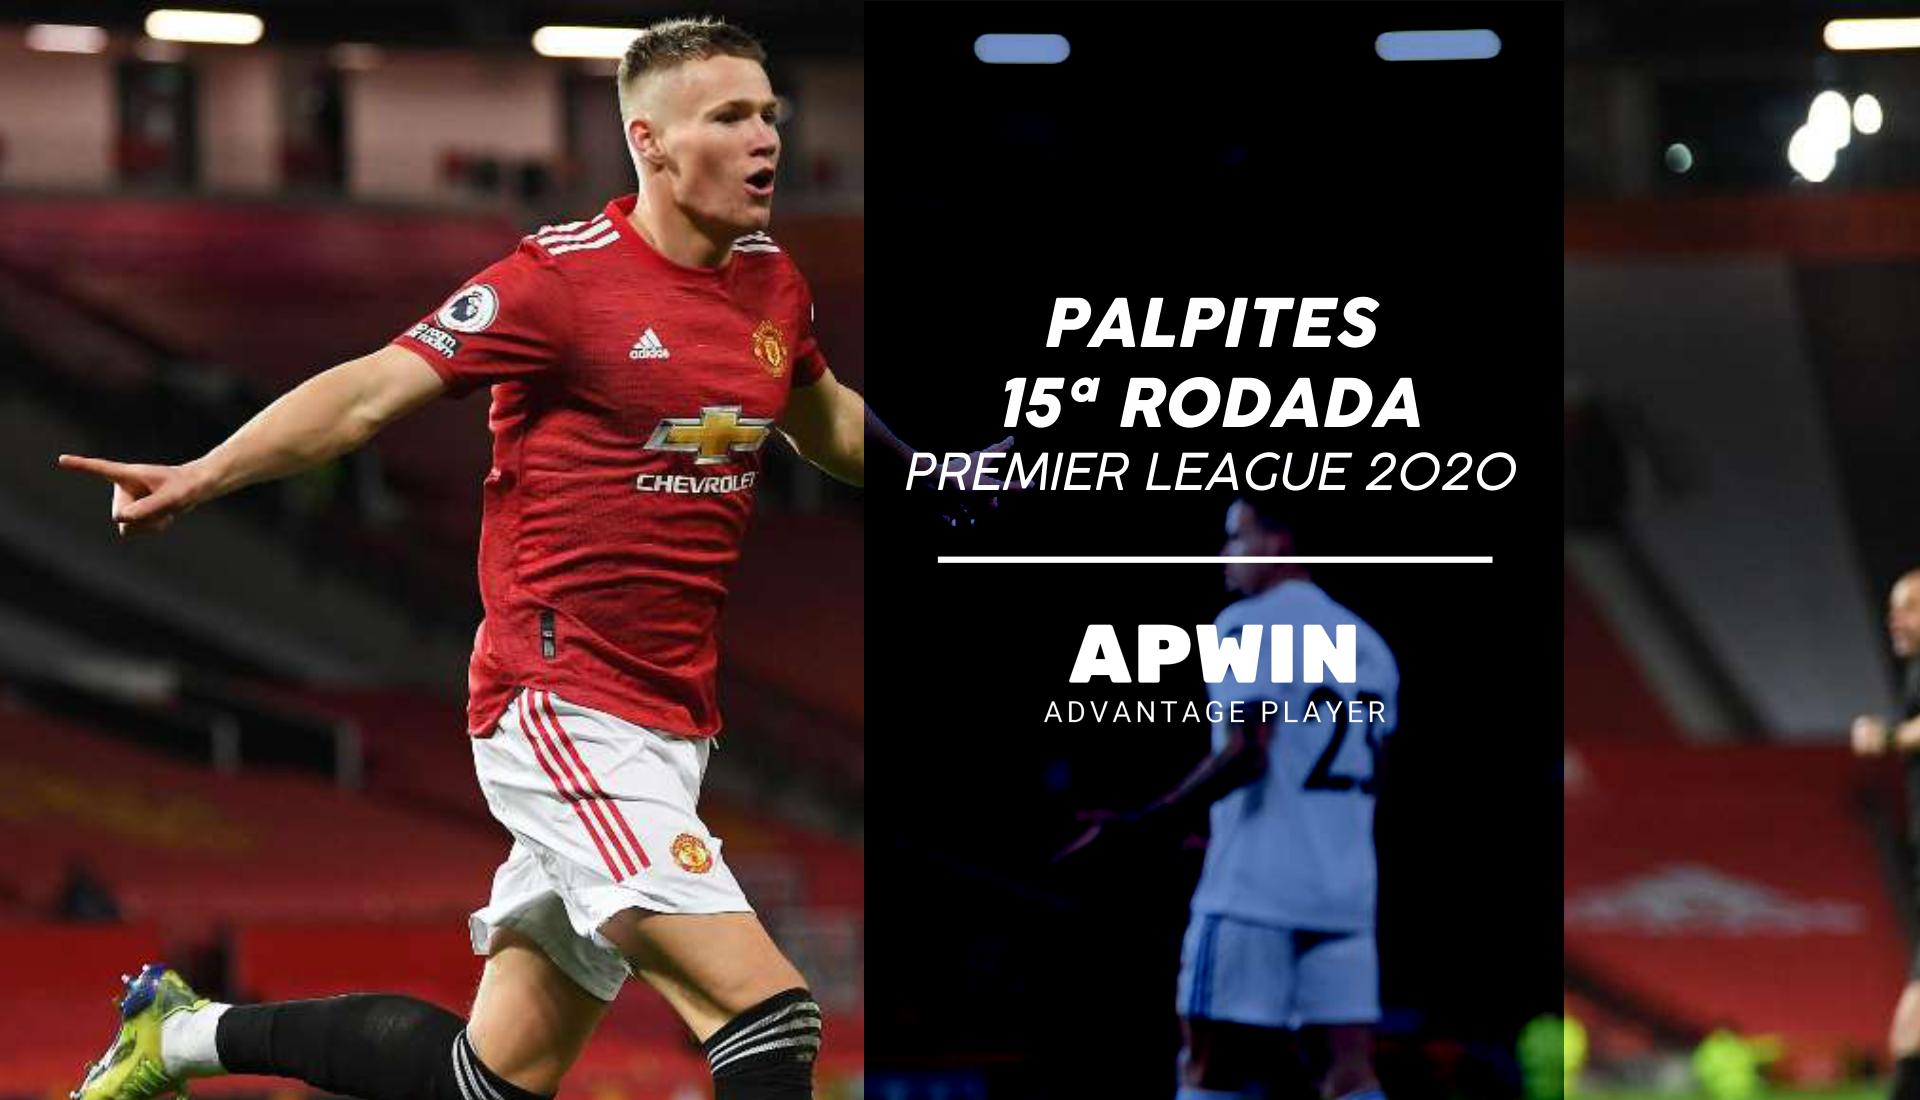 Palpites 15ª Rodada Do Campeonato Ingles 2020 2021 Premier League